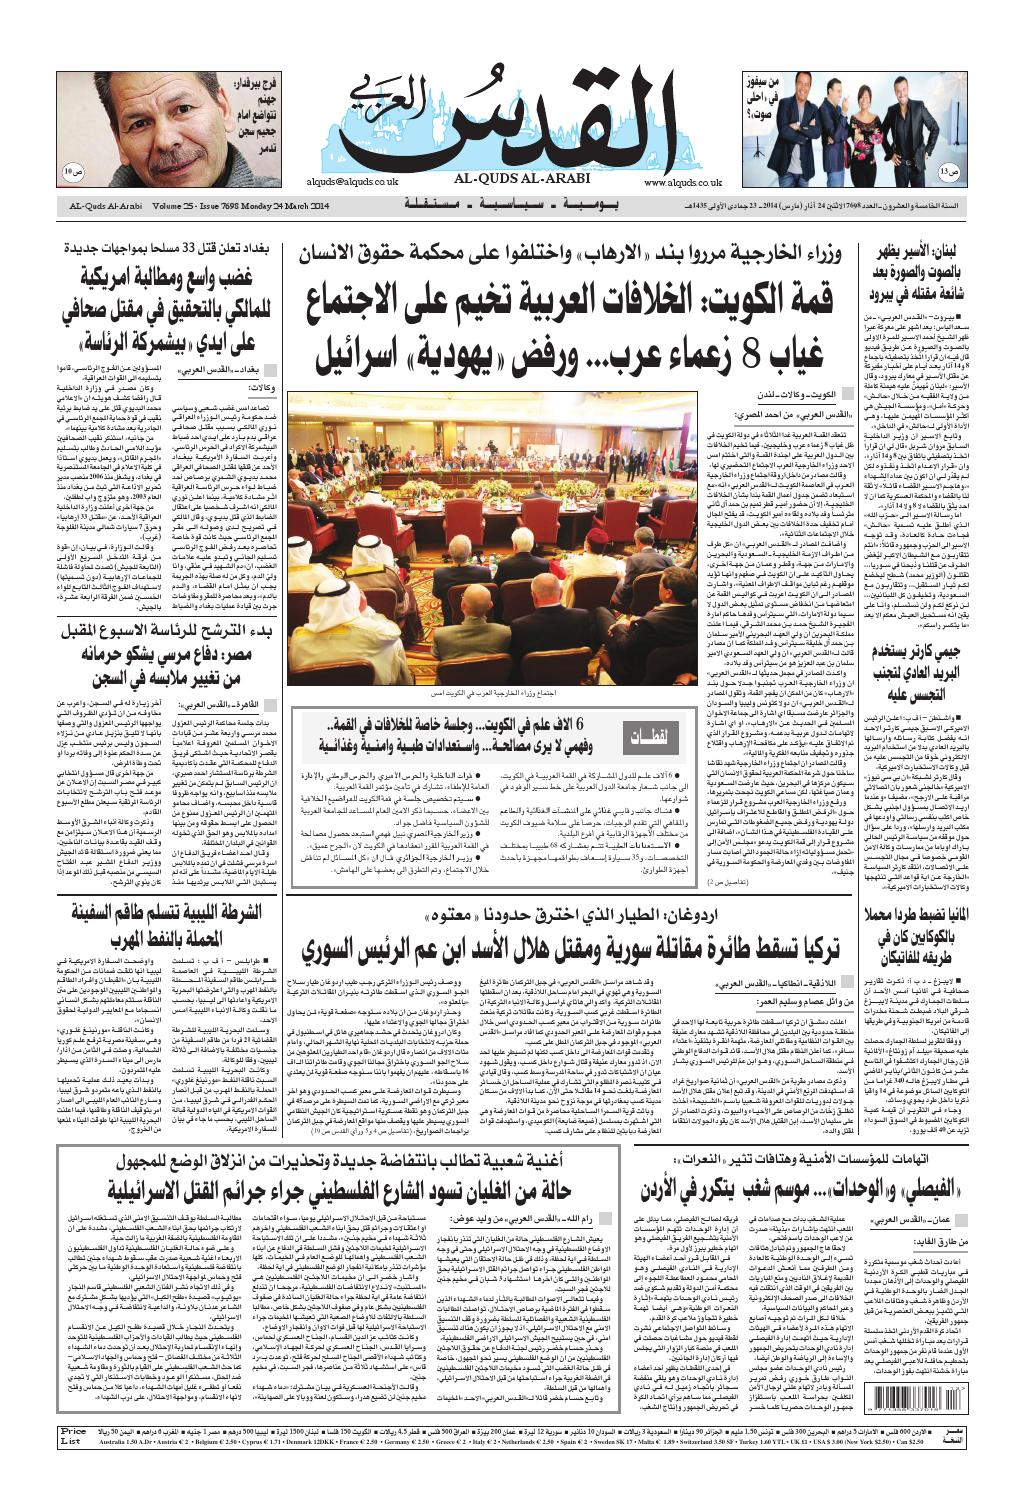 385a00c92 صحيفة القدس العربي , الإثنين 24.03.2014 by مركز الحدث - issuu